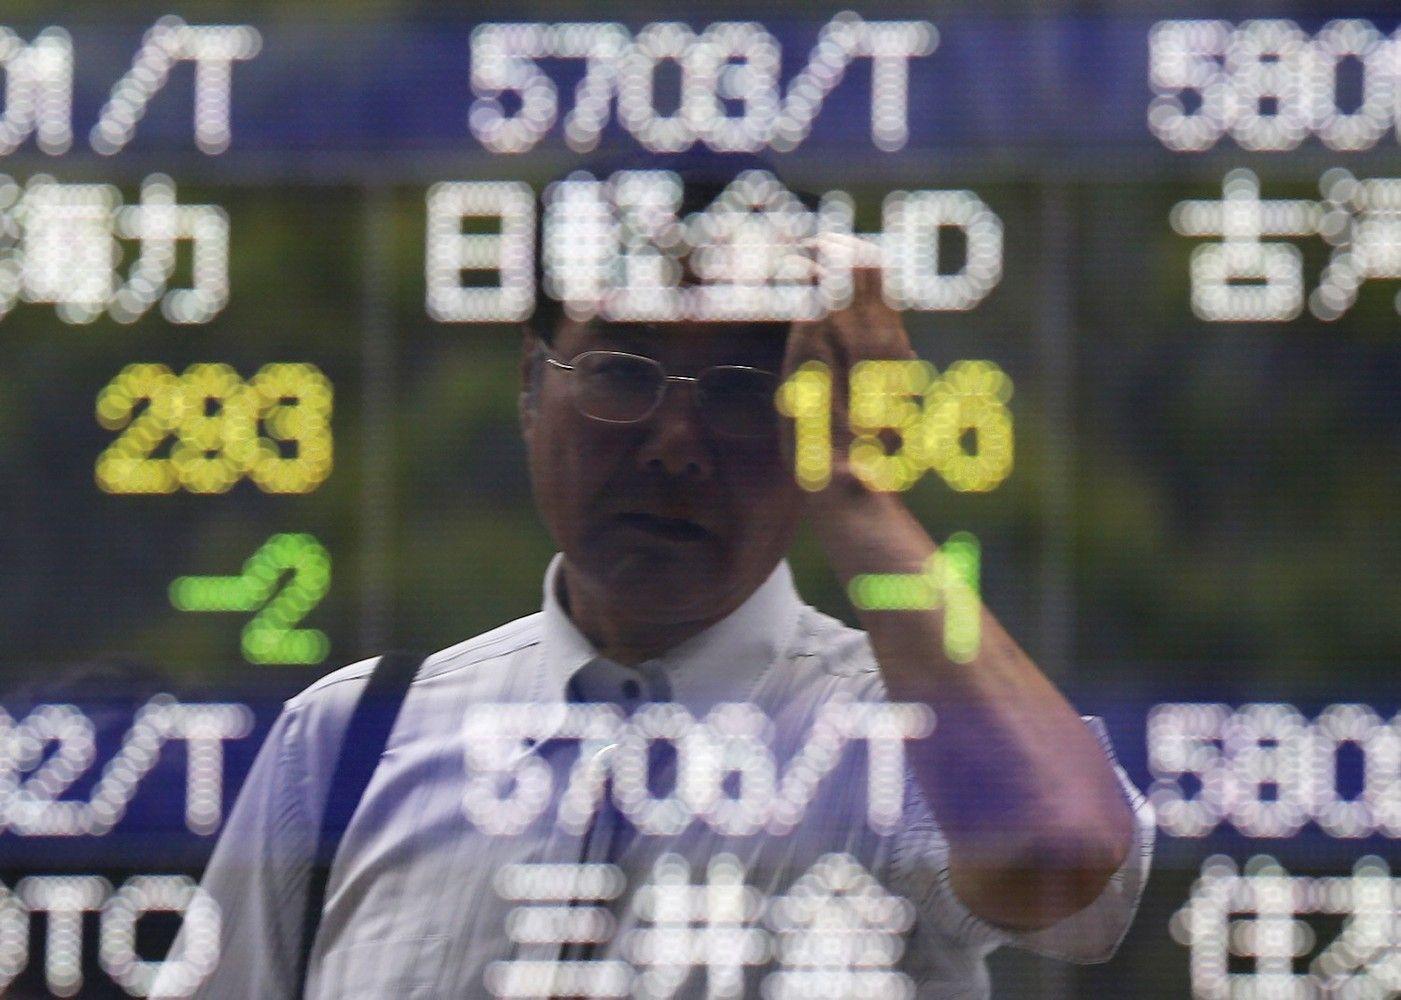 Asia Stocks Reverse Gains as Korea Angst Lingers: Markets Wrap